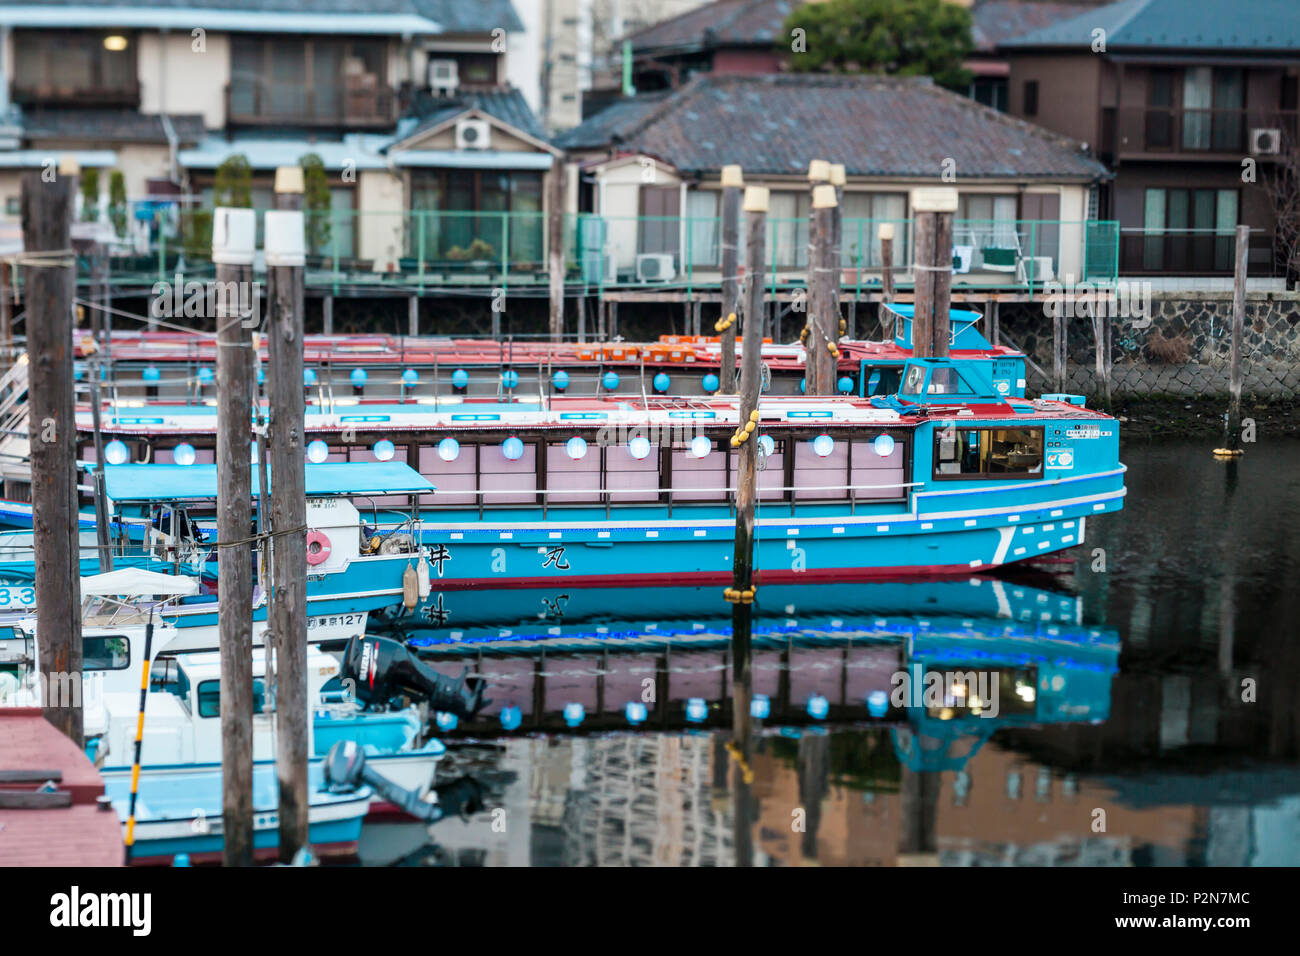 Nostalgische Freizeitaktivitäten Boote mit Laternen in Kita-Shinagawa, Shinagawa, Tokio, Japan Stockbild